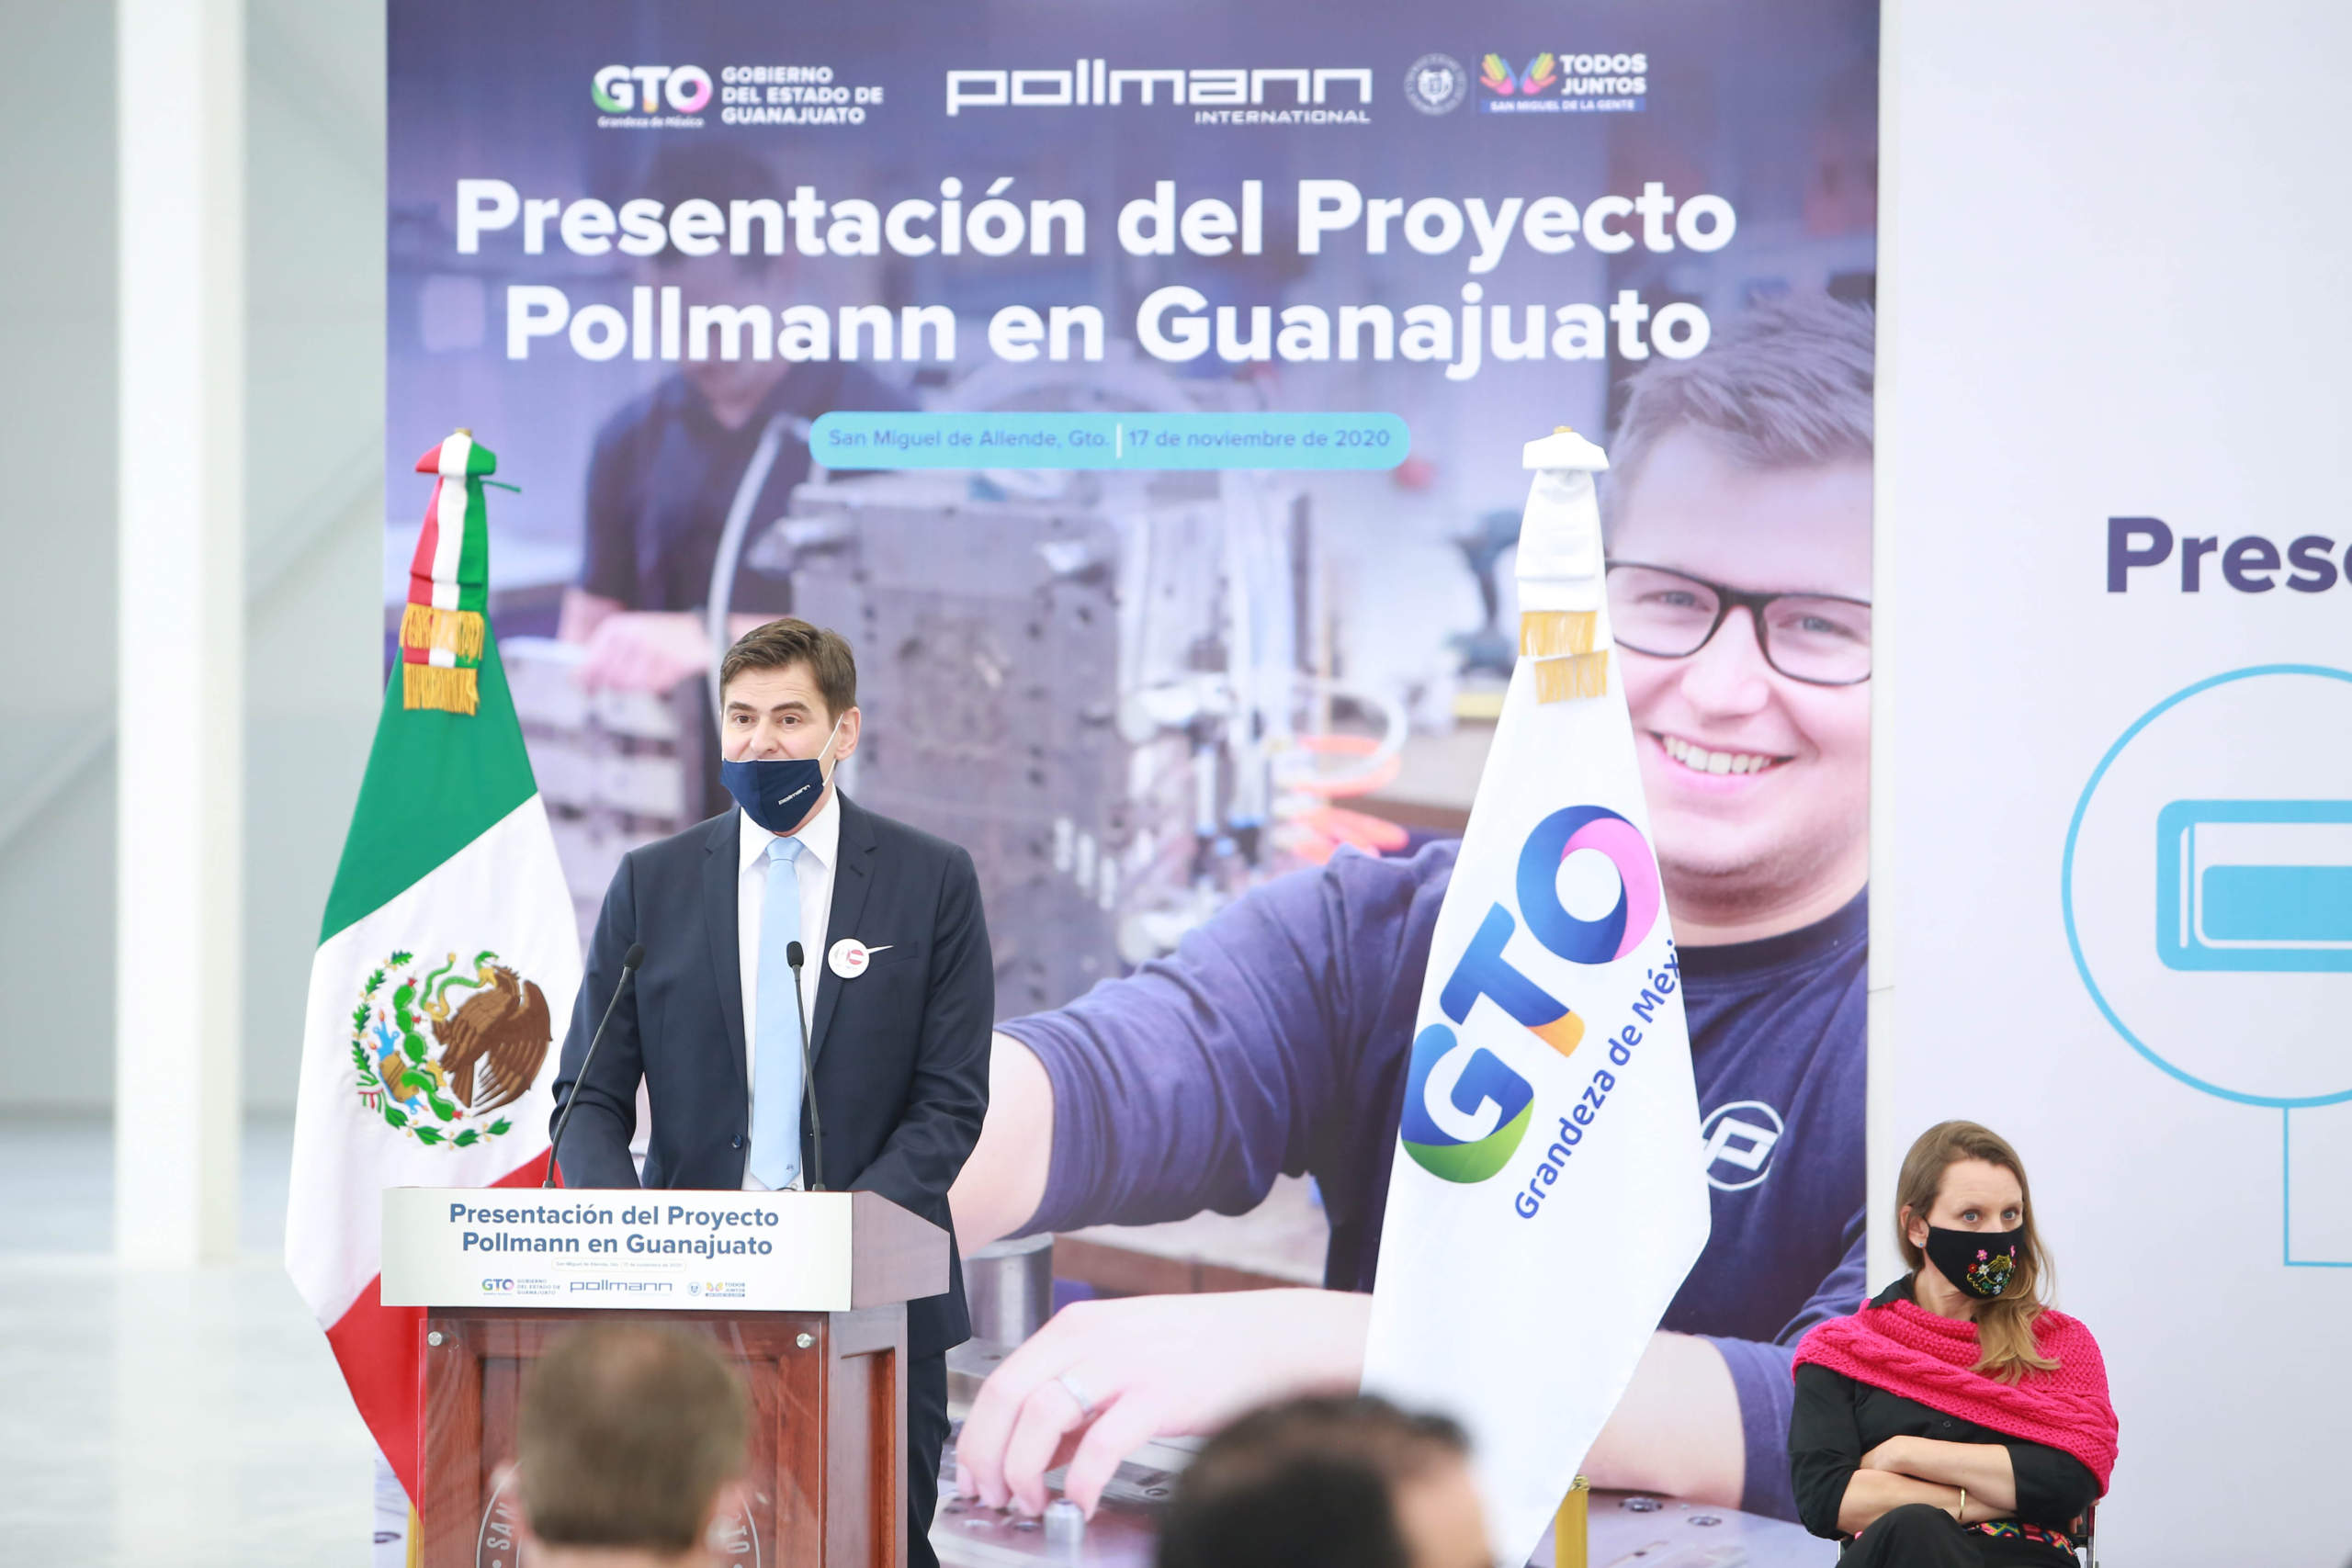 Pollmann invests US$4.45 million in Guanajuato